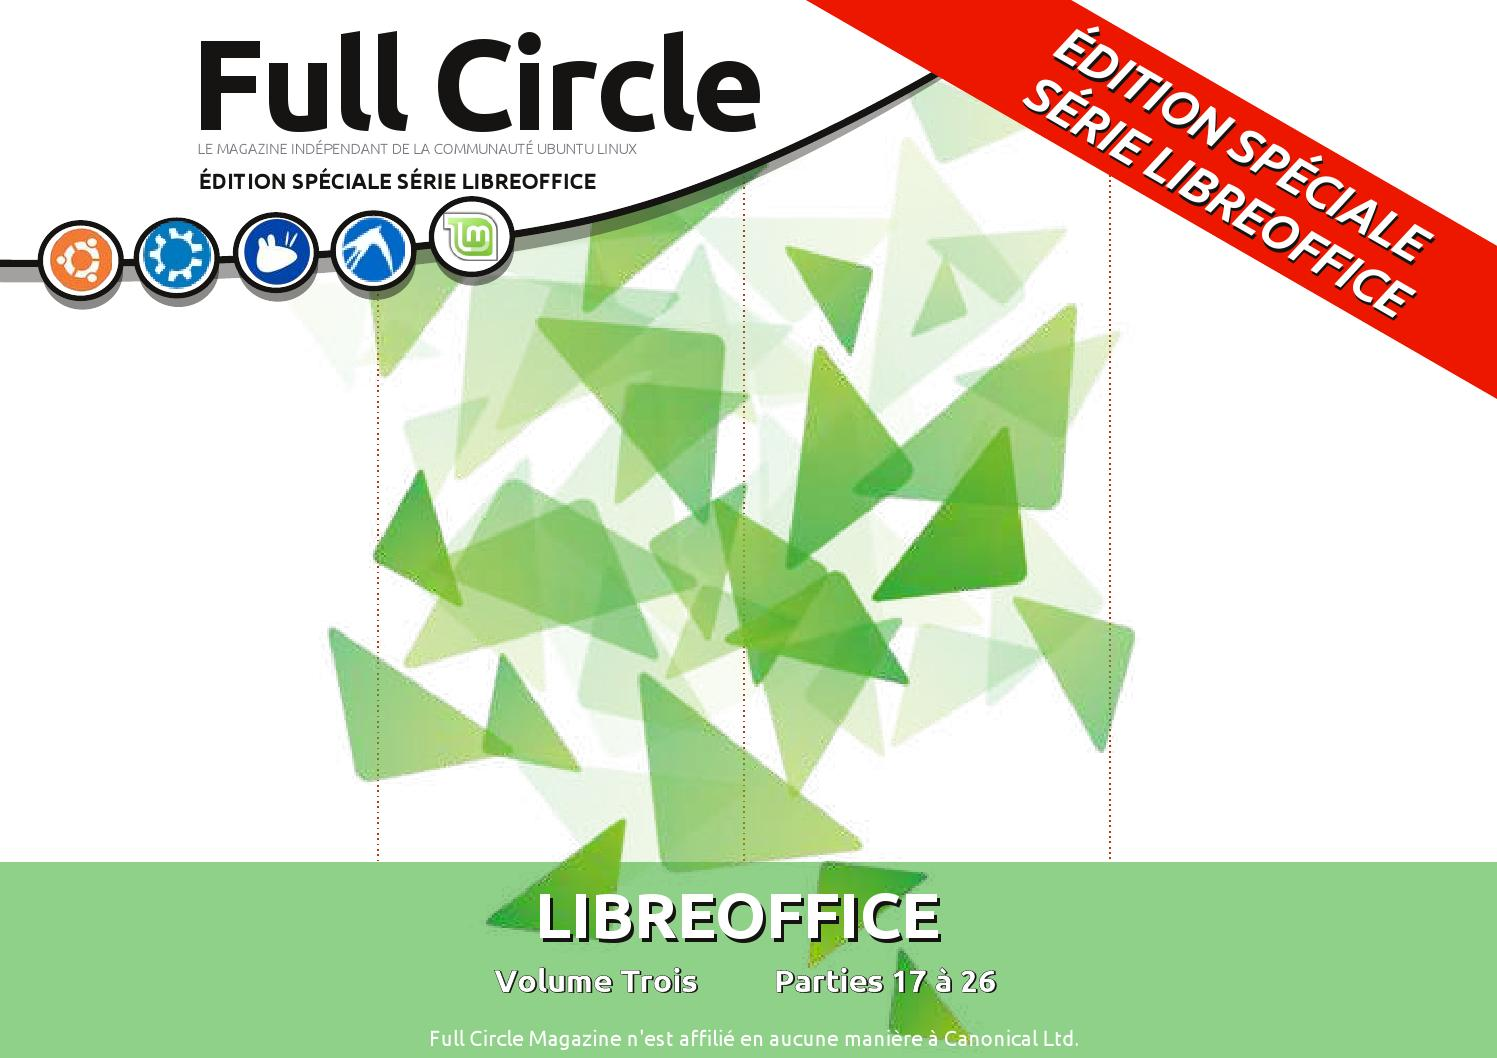 Full Circle Numéro Spécial Libreoffice Vol 3 By Genea